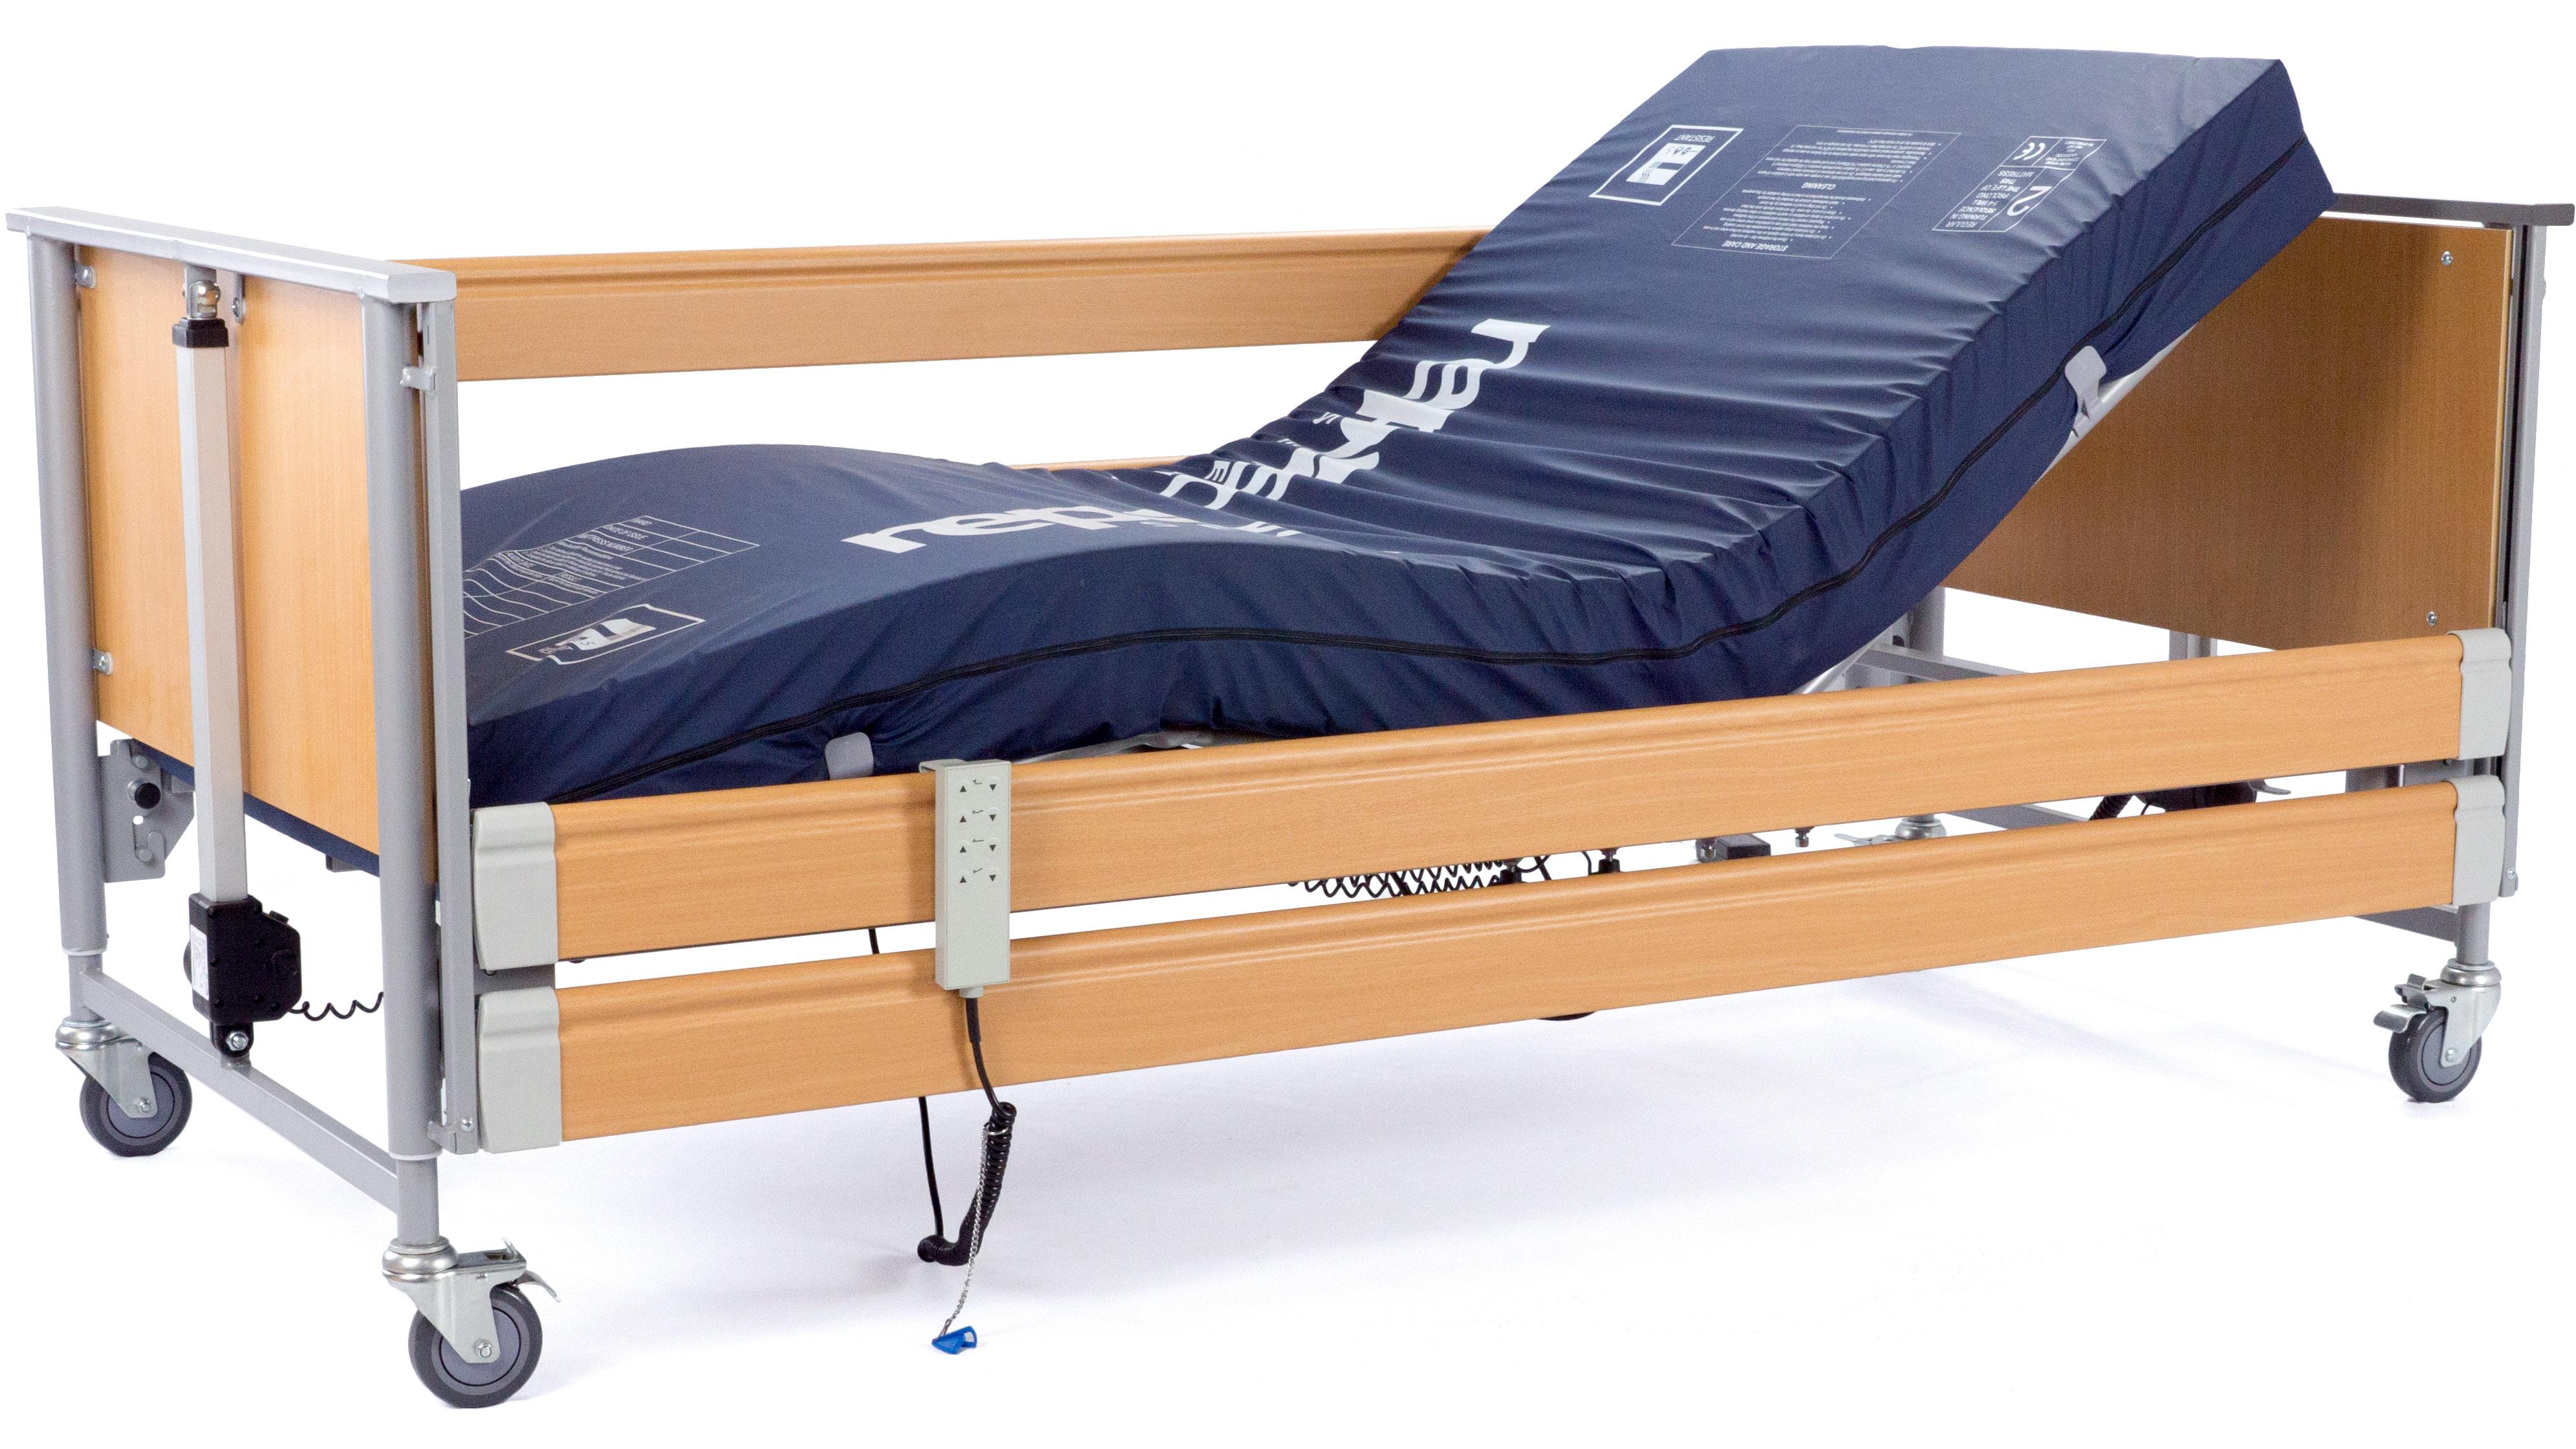 opera eco profiling bed with integral side rails. Black Bedroom Furniture Sets. Home Design Ideas